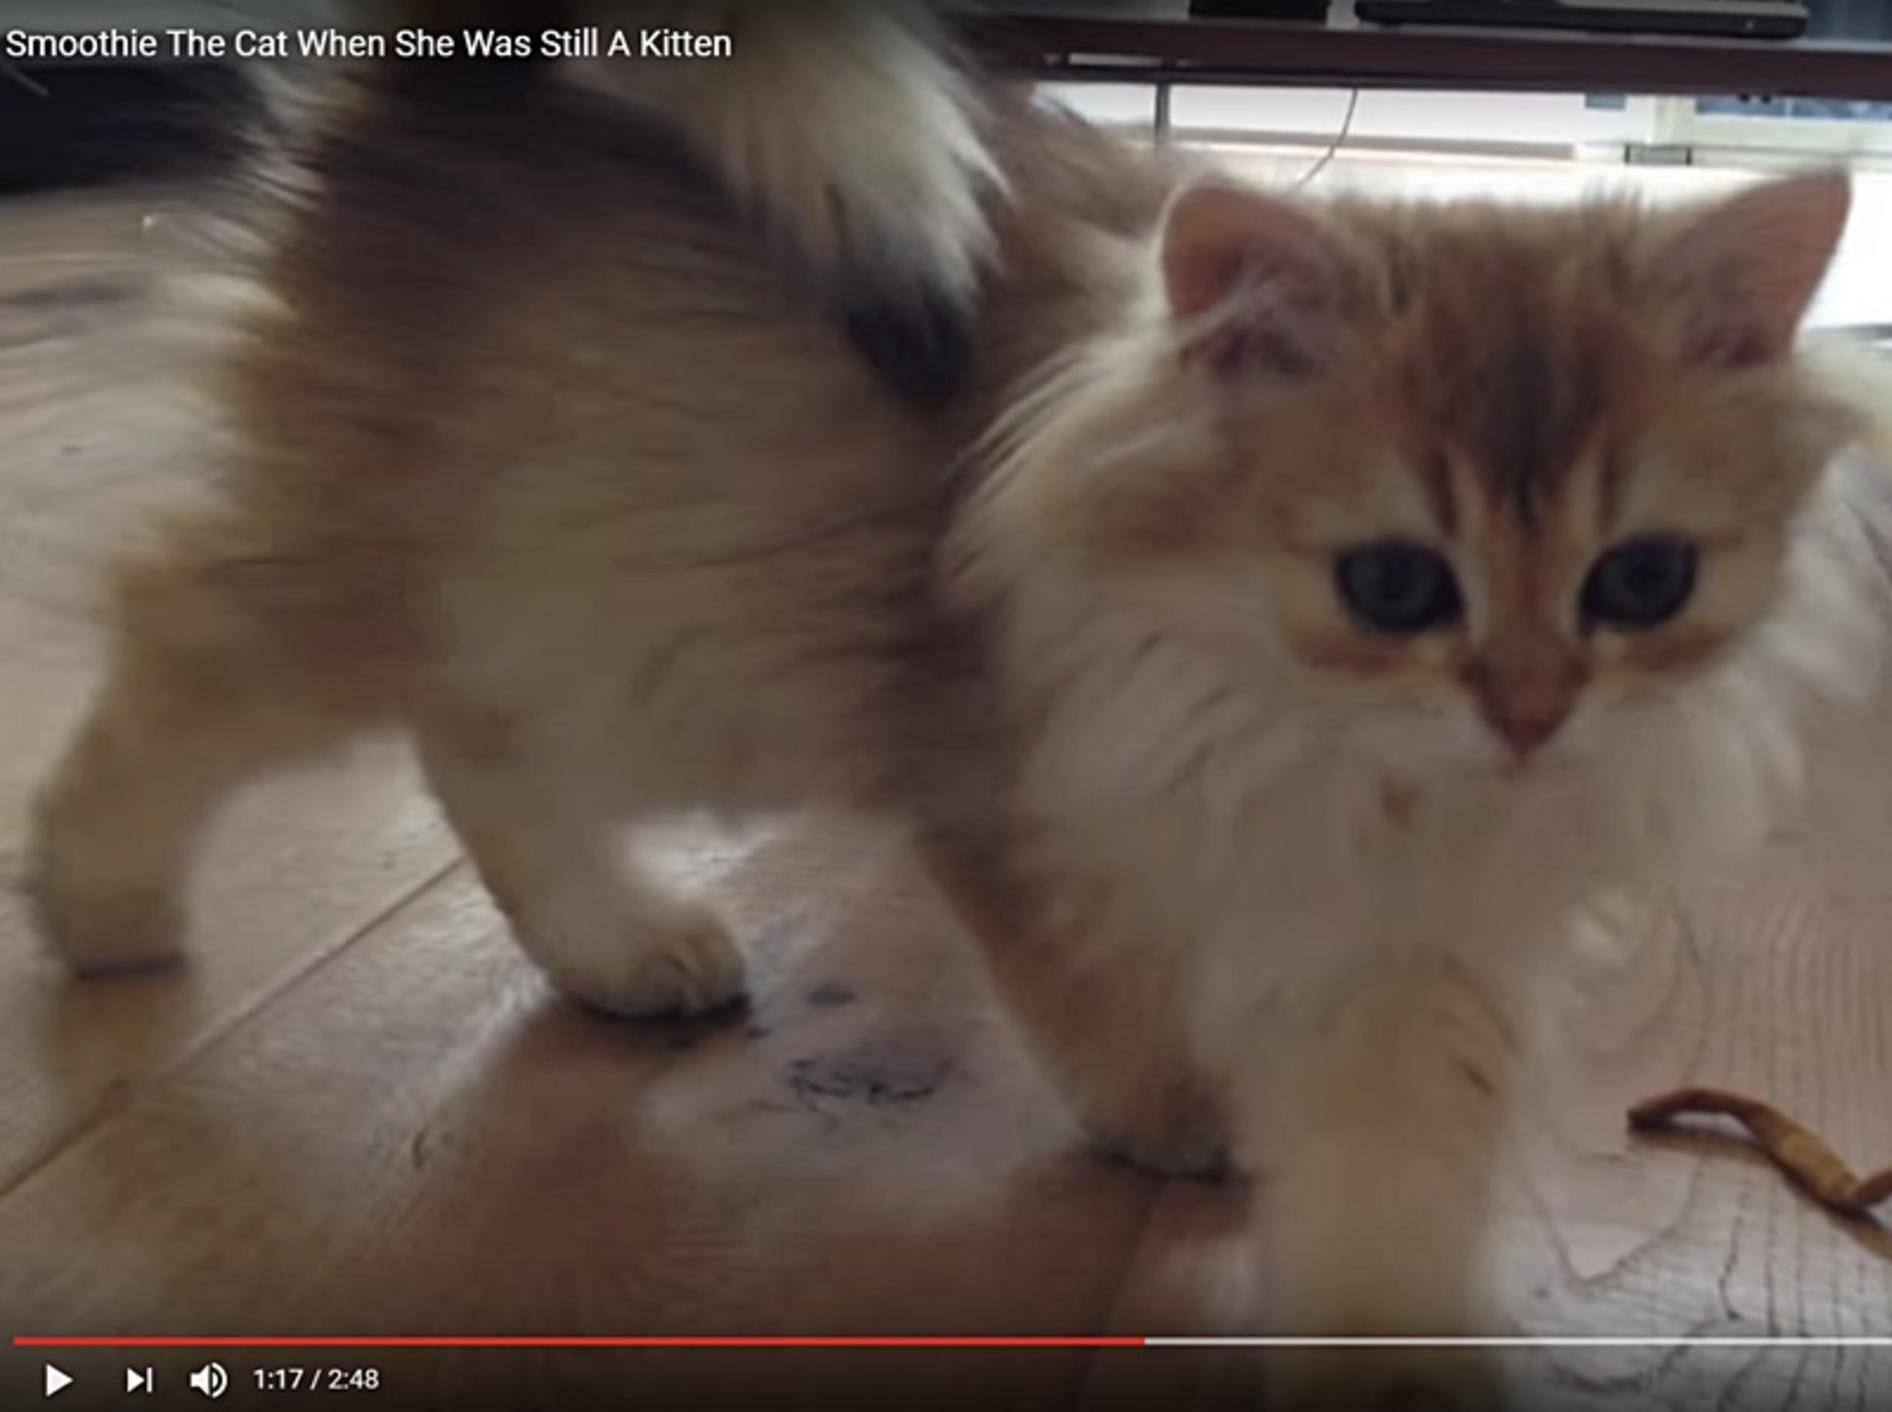 Katze-Smoothie-So-suess-als-Minimiez